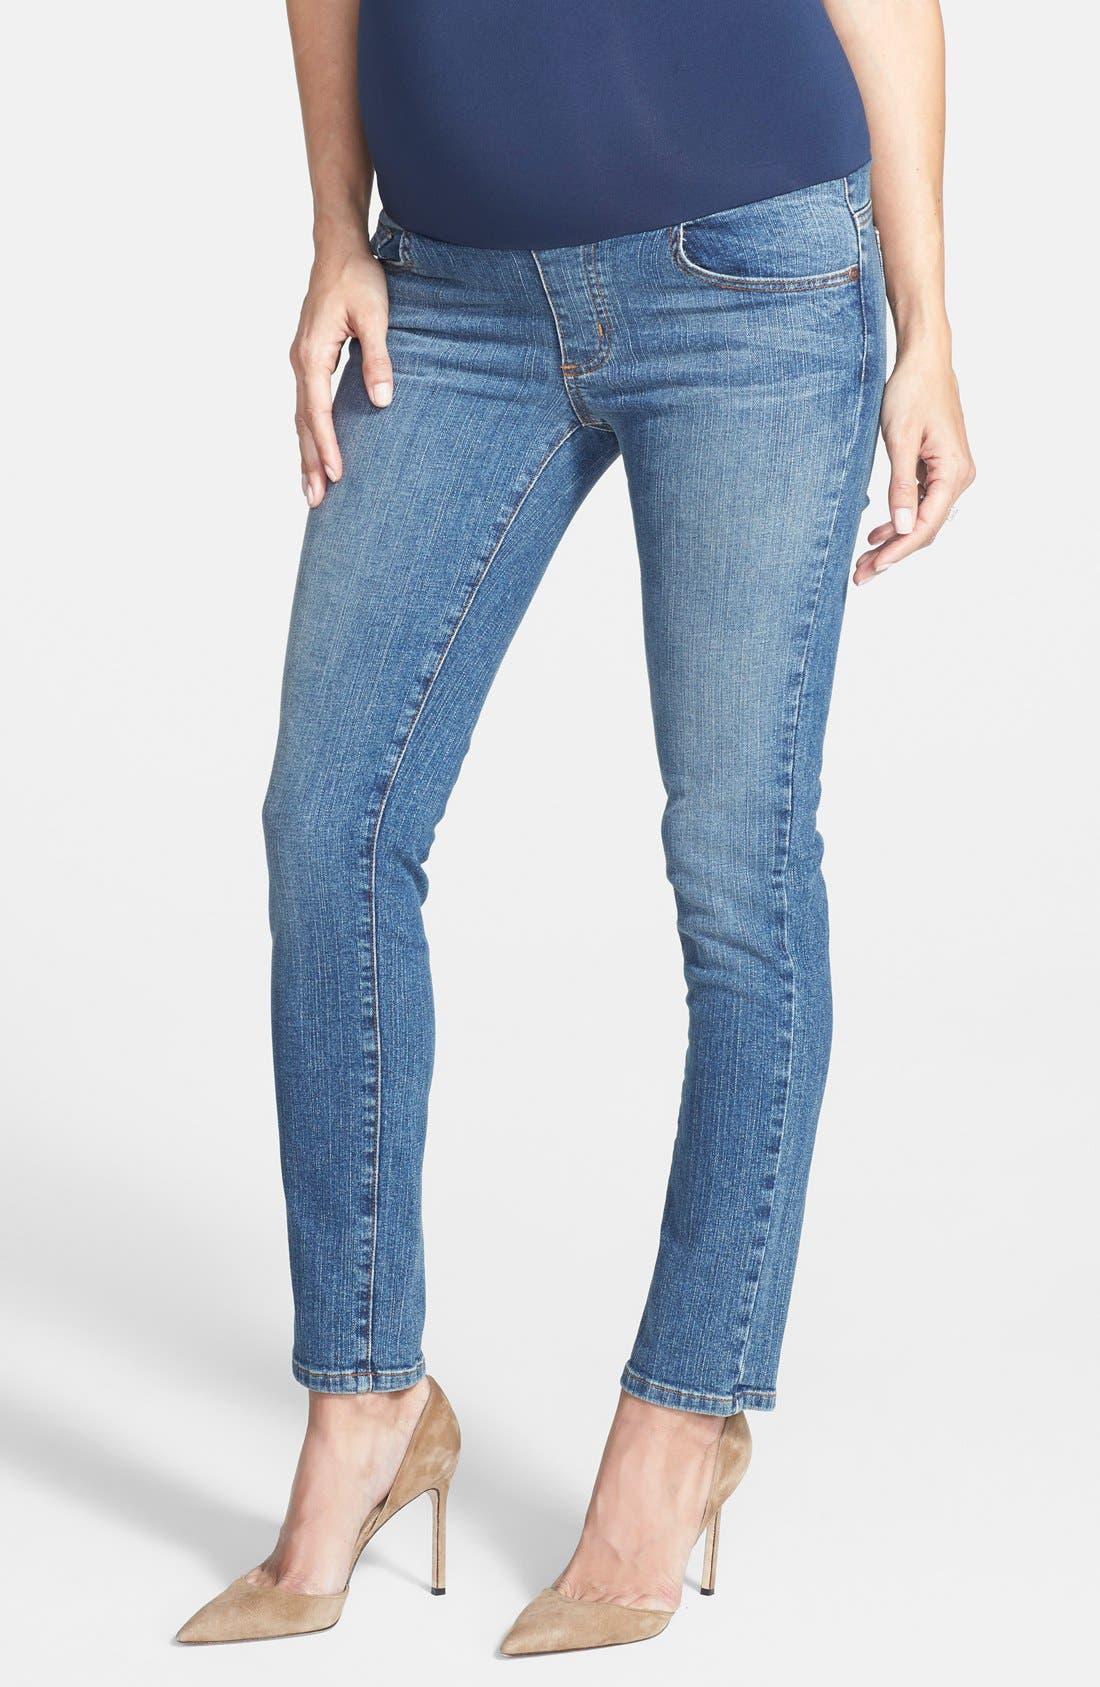 Maternal America Maternity Skinny Ankle Jeans